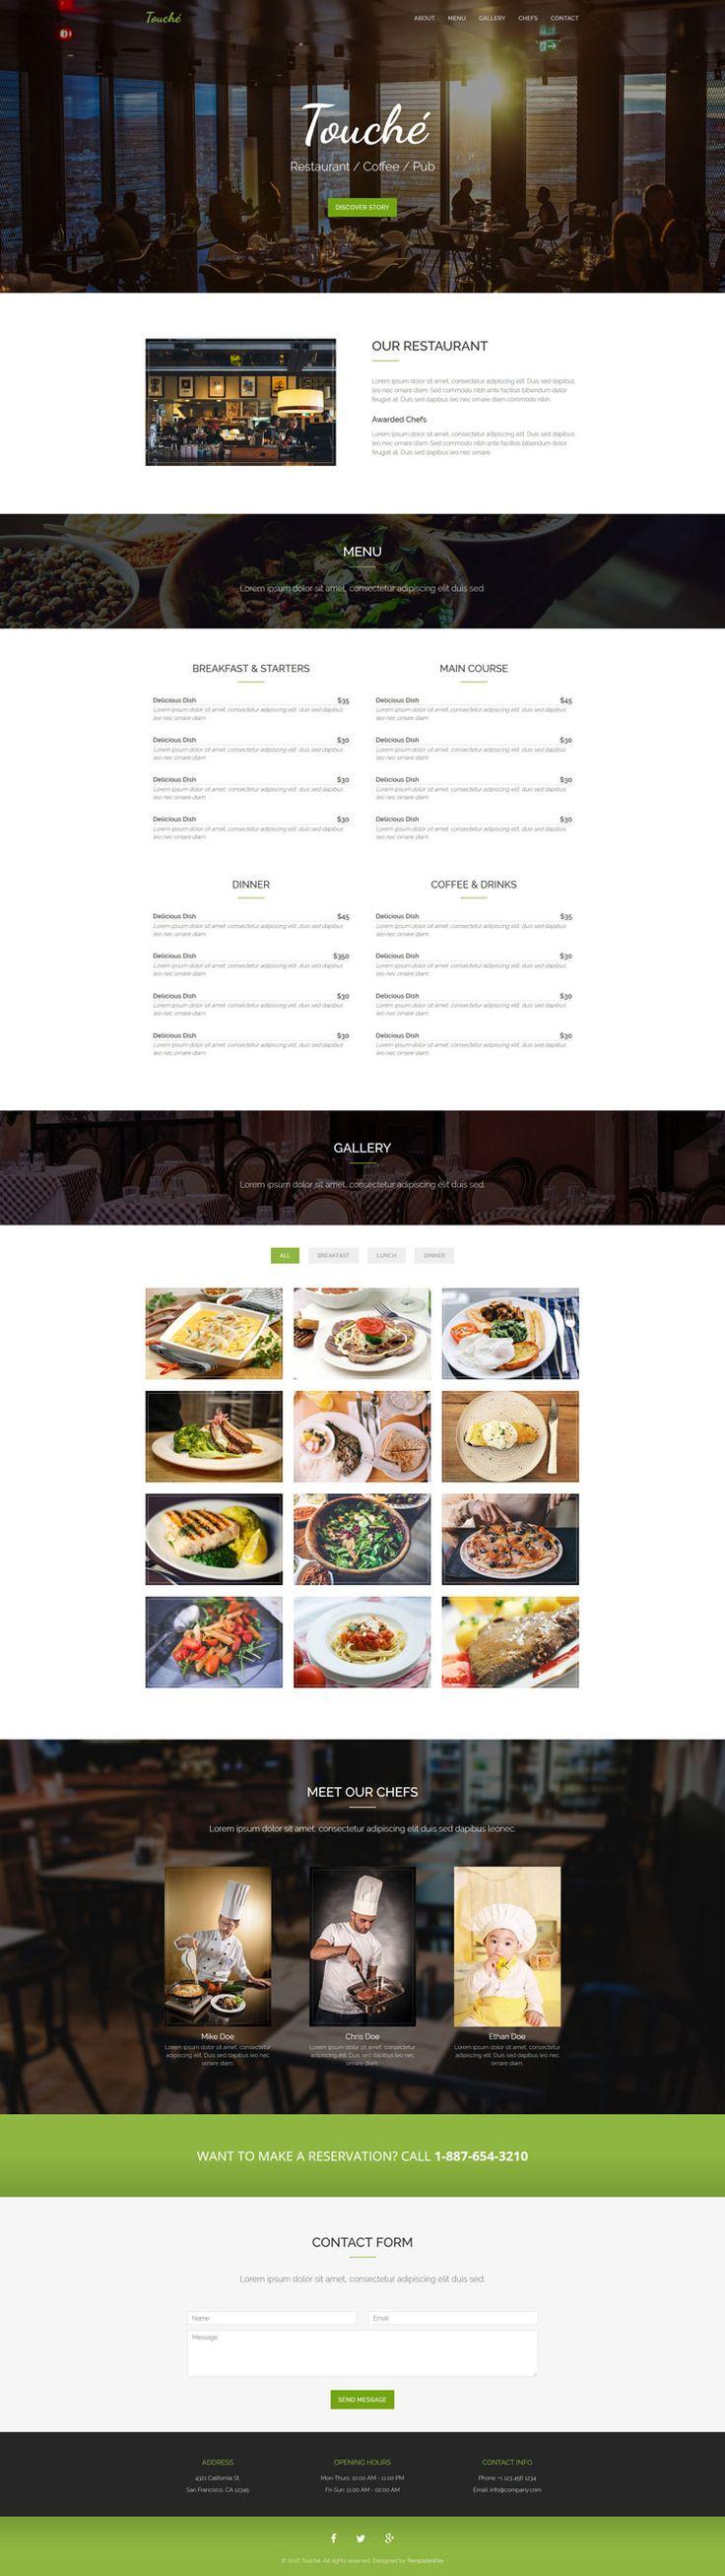 Touche - Restaurant Website Template - Free Download